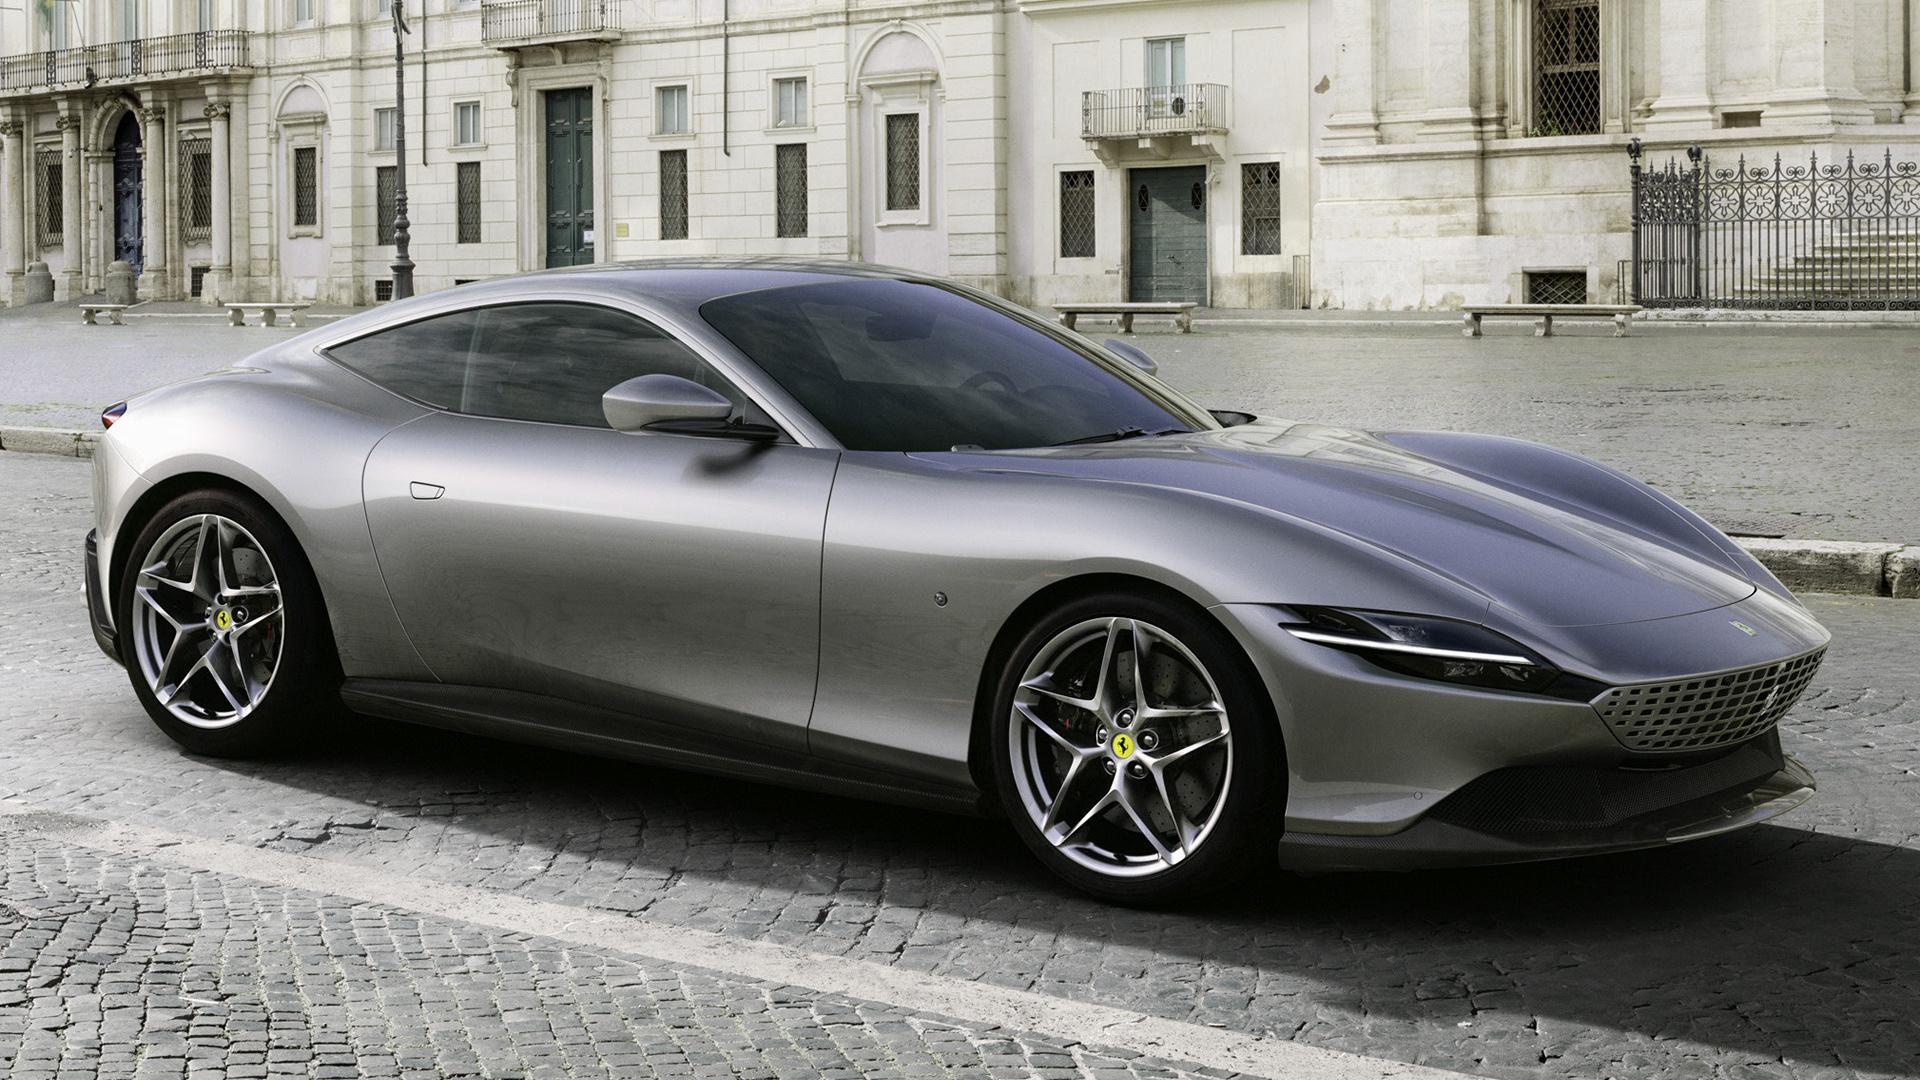 2020 Ferrari Roma Wallpapers And Hd Images Car Pixel